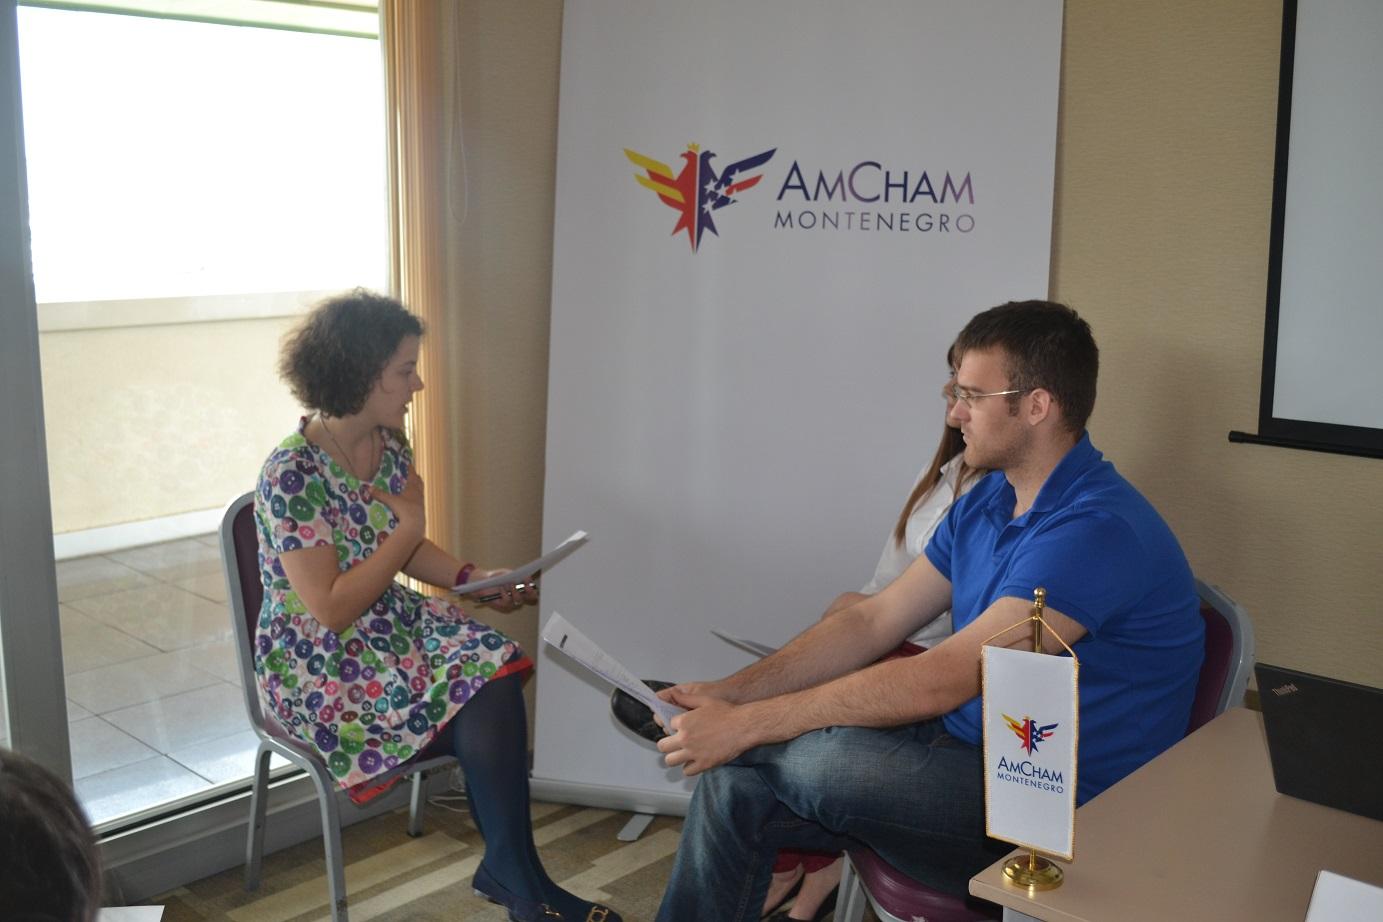 aip workshop interviewing skills amcham aip workshop interviewing skills 2015 17